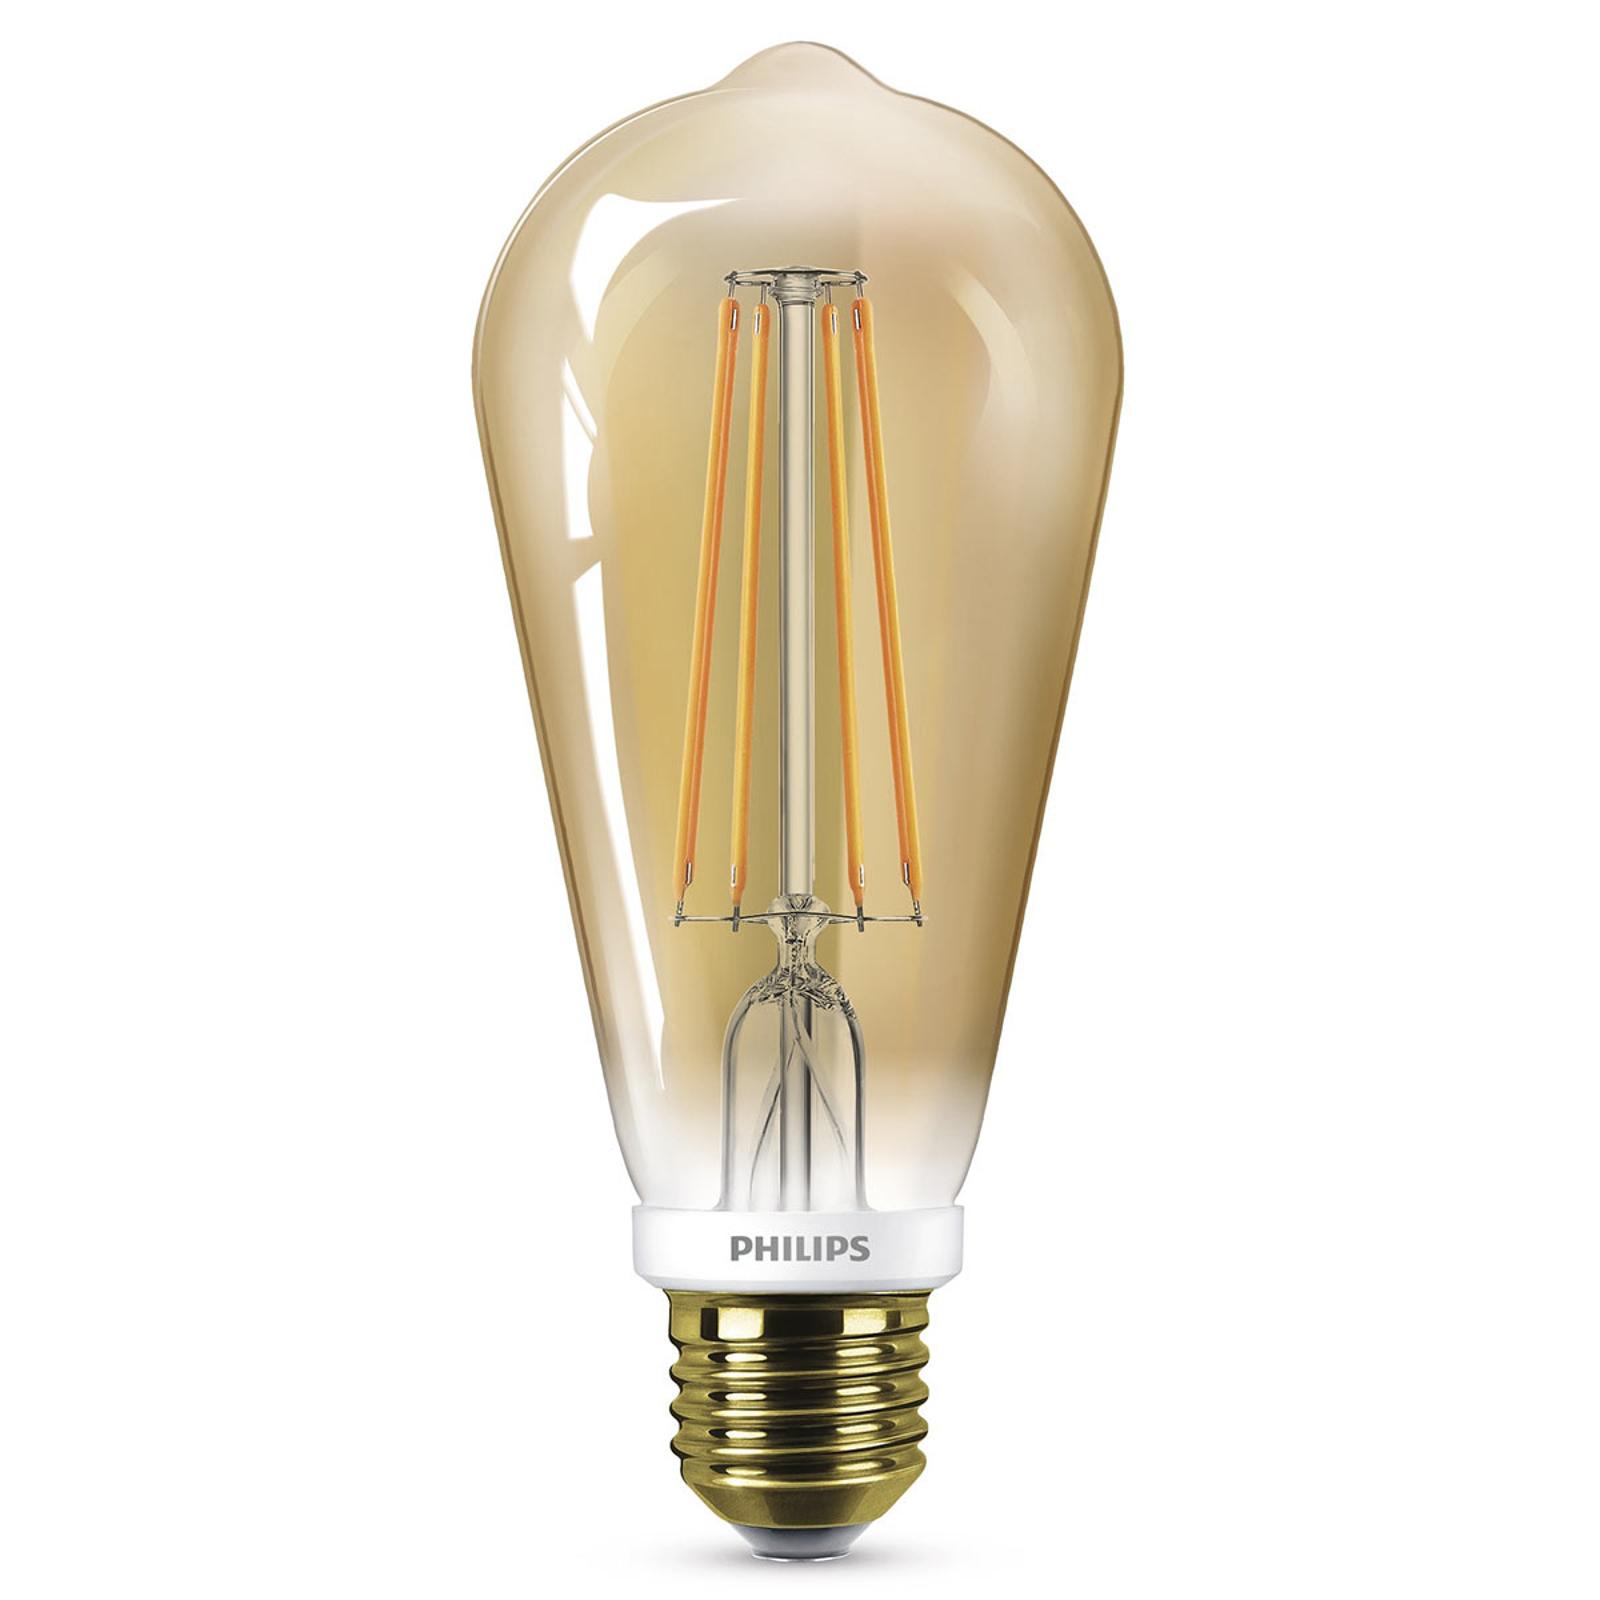 Philips lampadina LED E27 ST64 5,5W oro, dimming